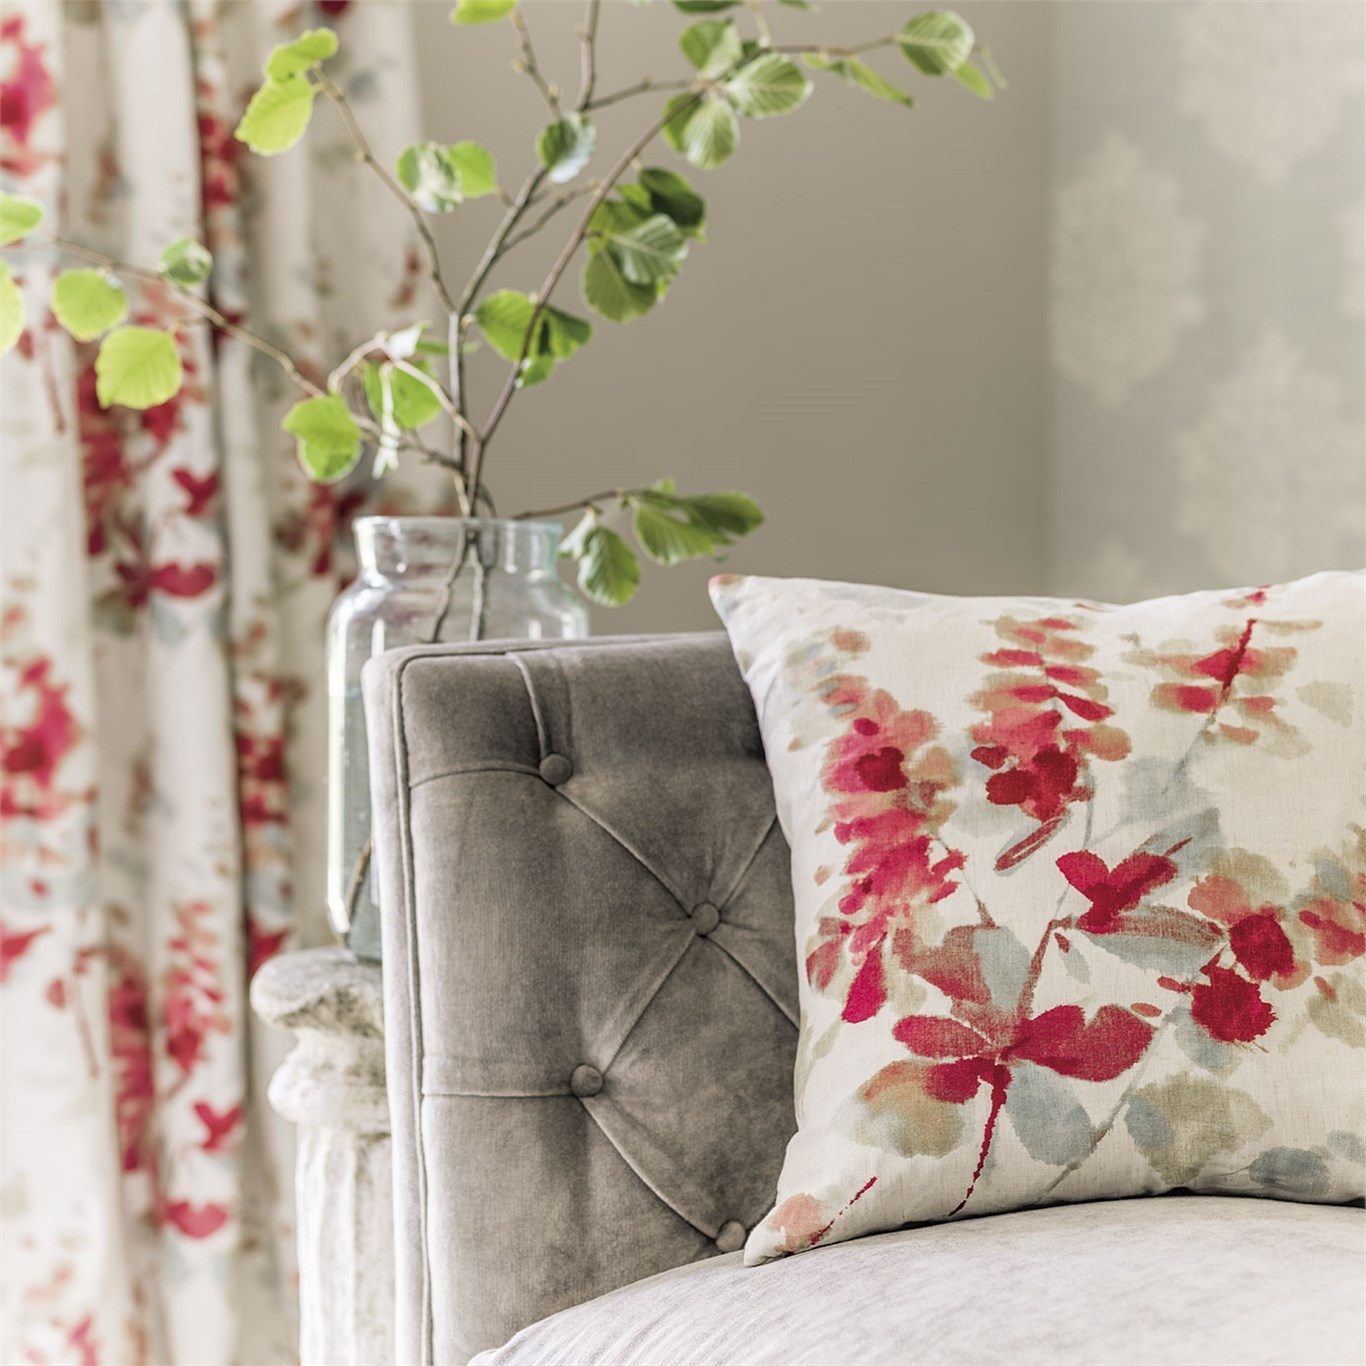 ... Sanderson Delphiniums Coral Fabric 226290